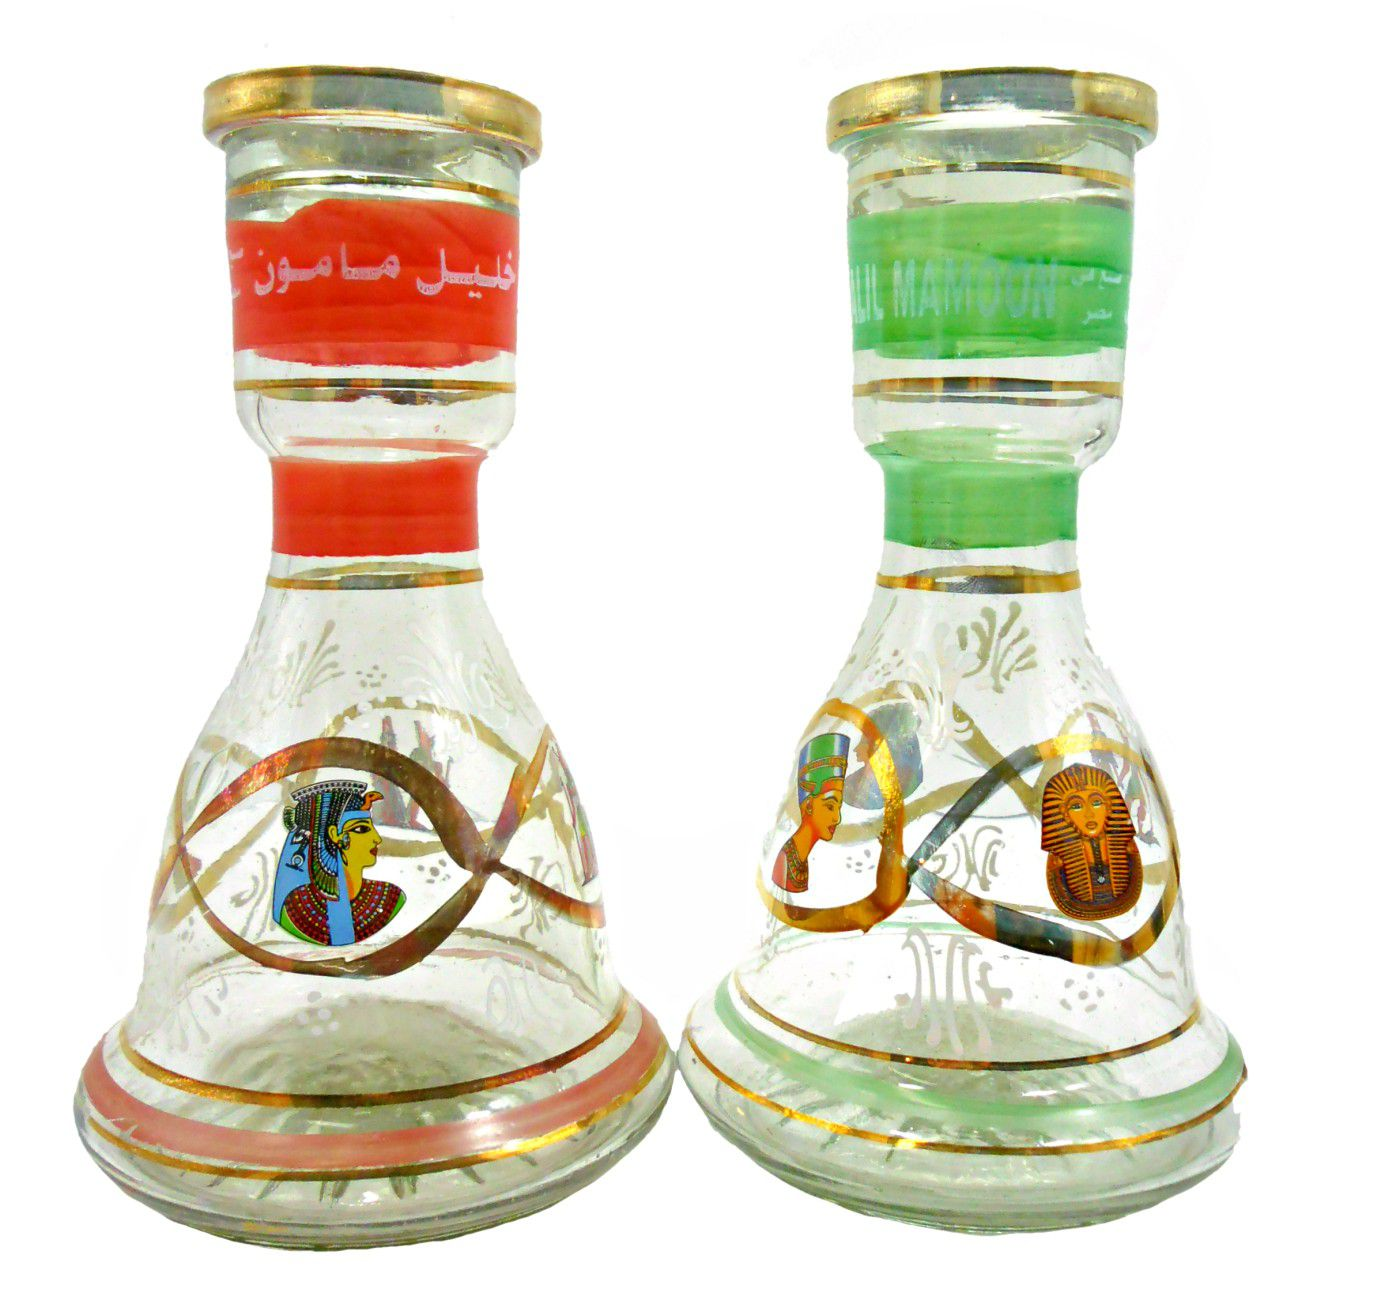 Vaso/base p/narguile vidro c/pintura artesanal LISTRA HORIZONTAL, egípcio Khalil Mammoon, SINO 22cm.